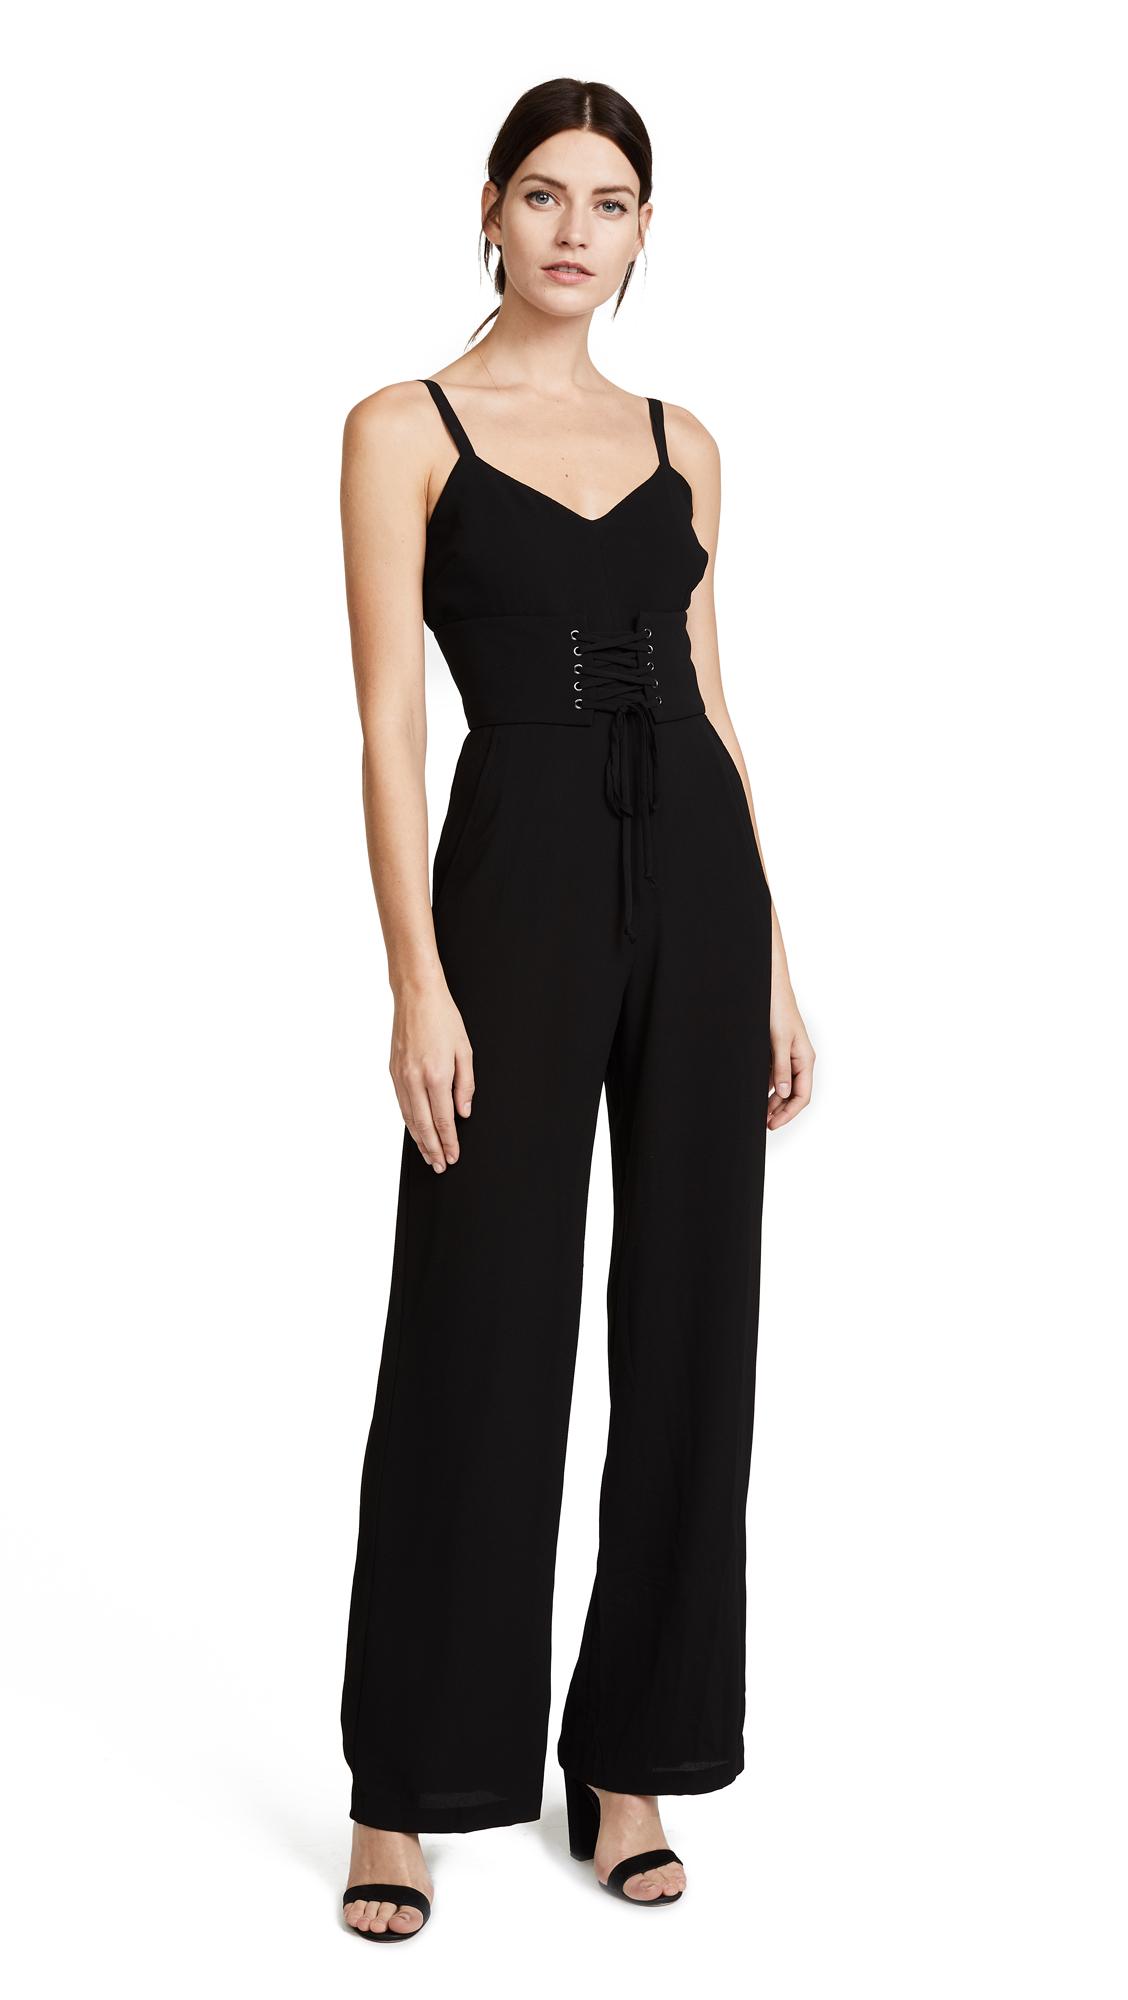 WAYF Ripley Corset Jumpsuit - Black